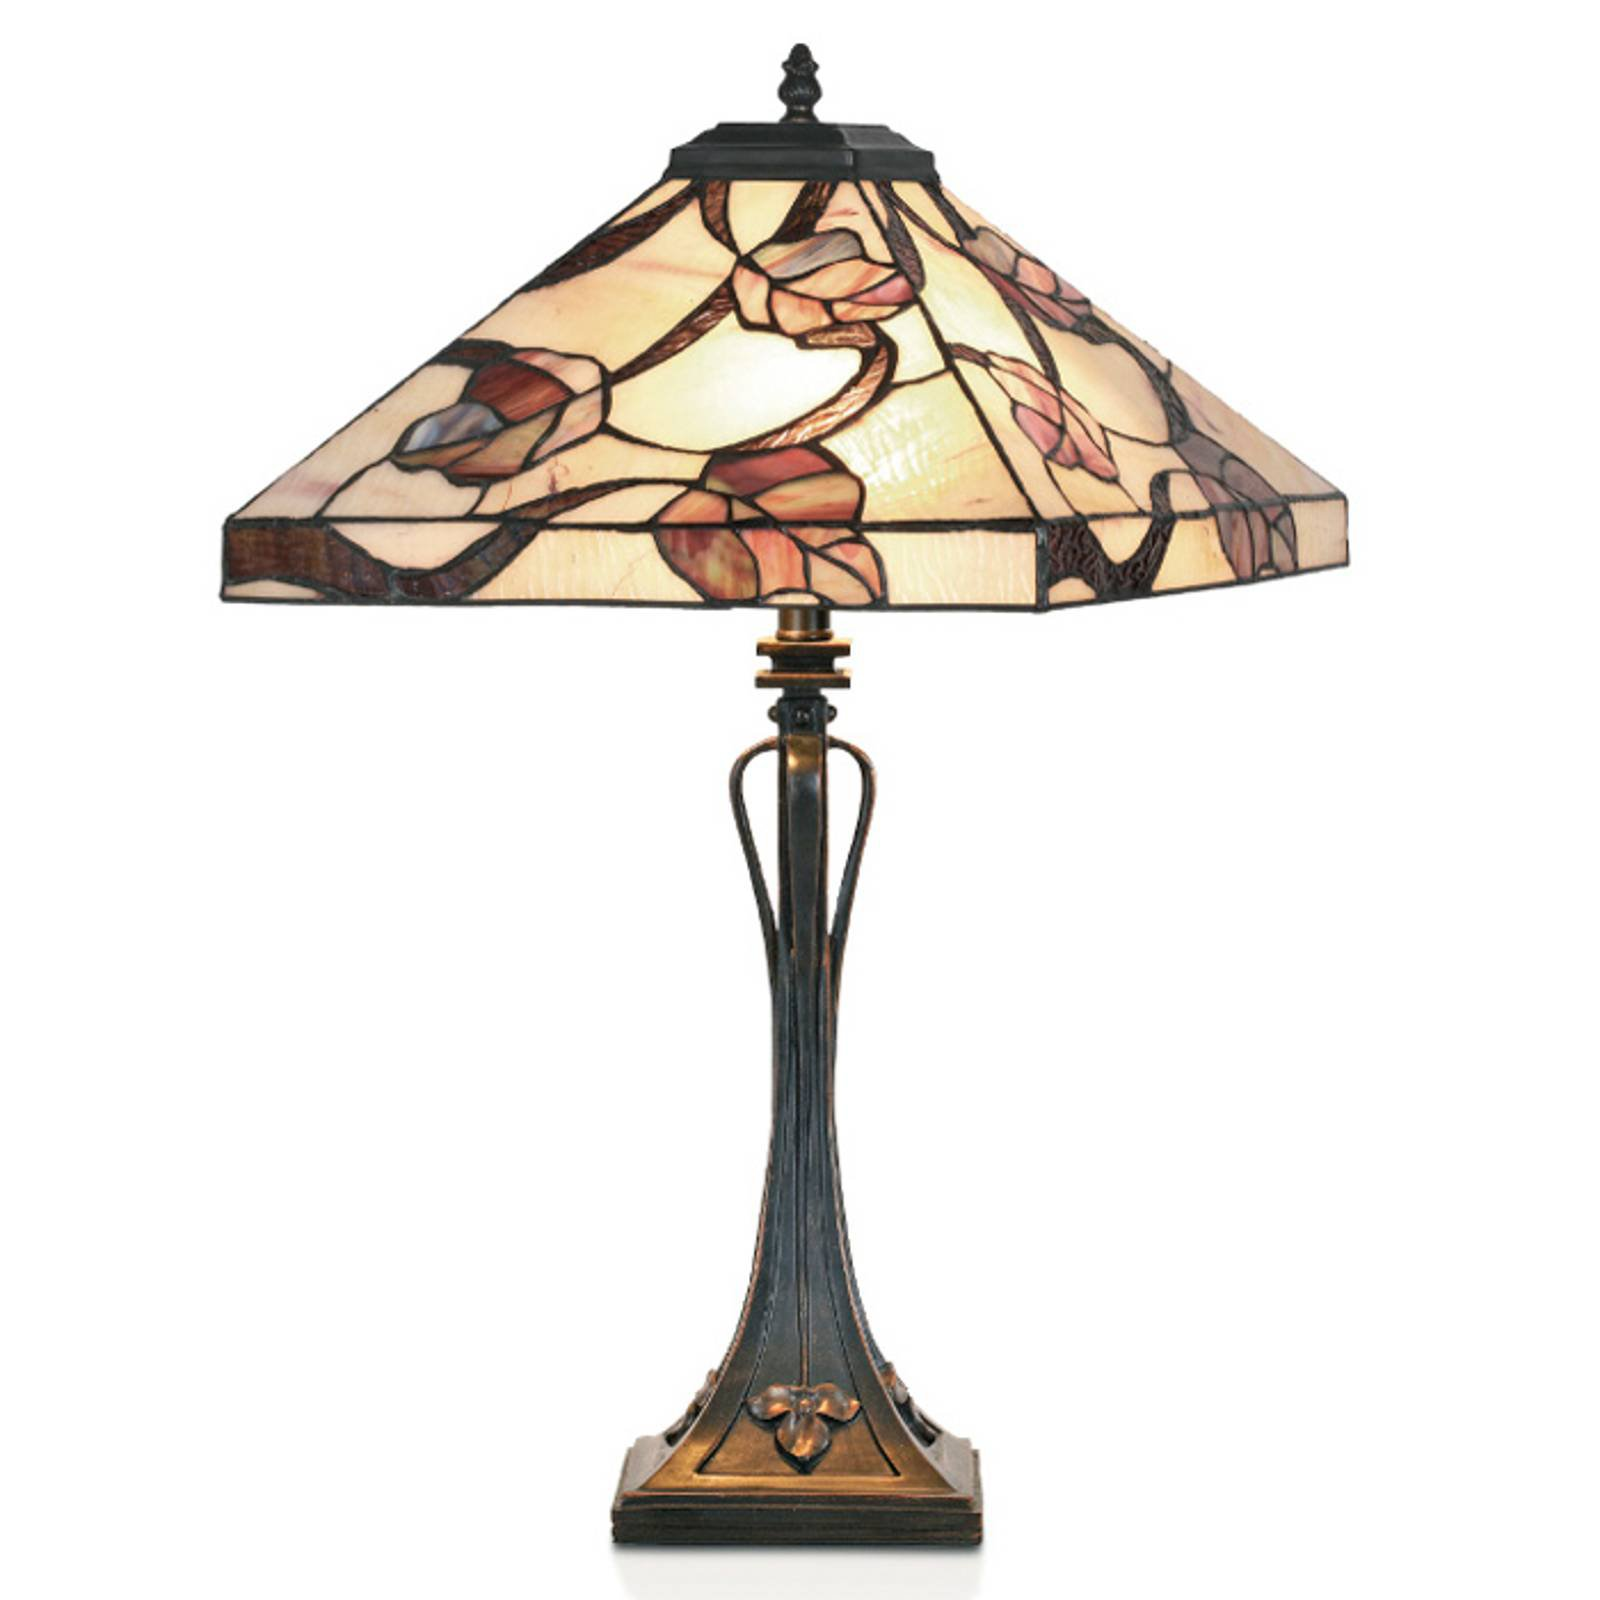 APPOLONIA bordlampe i Tiffany-stil